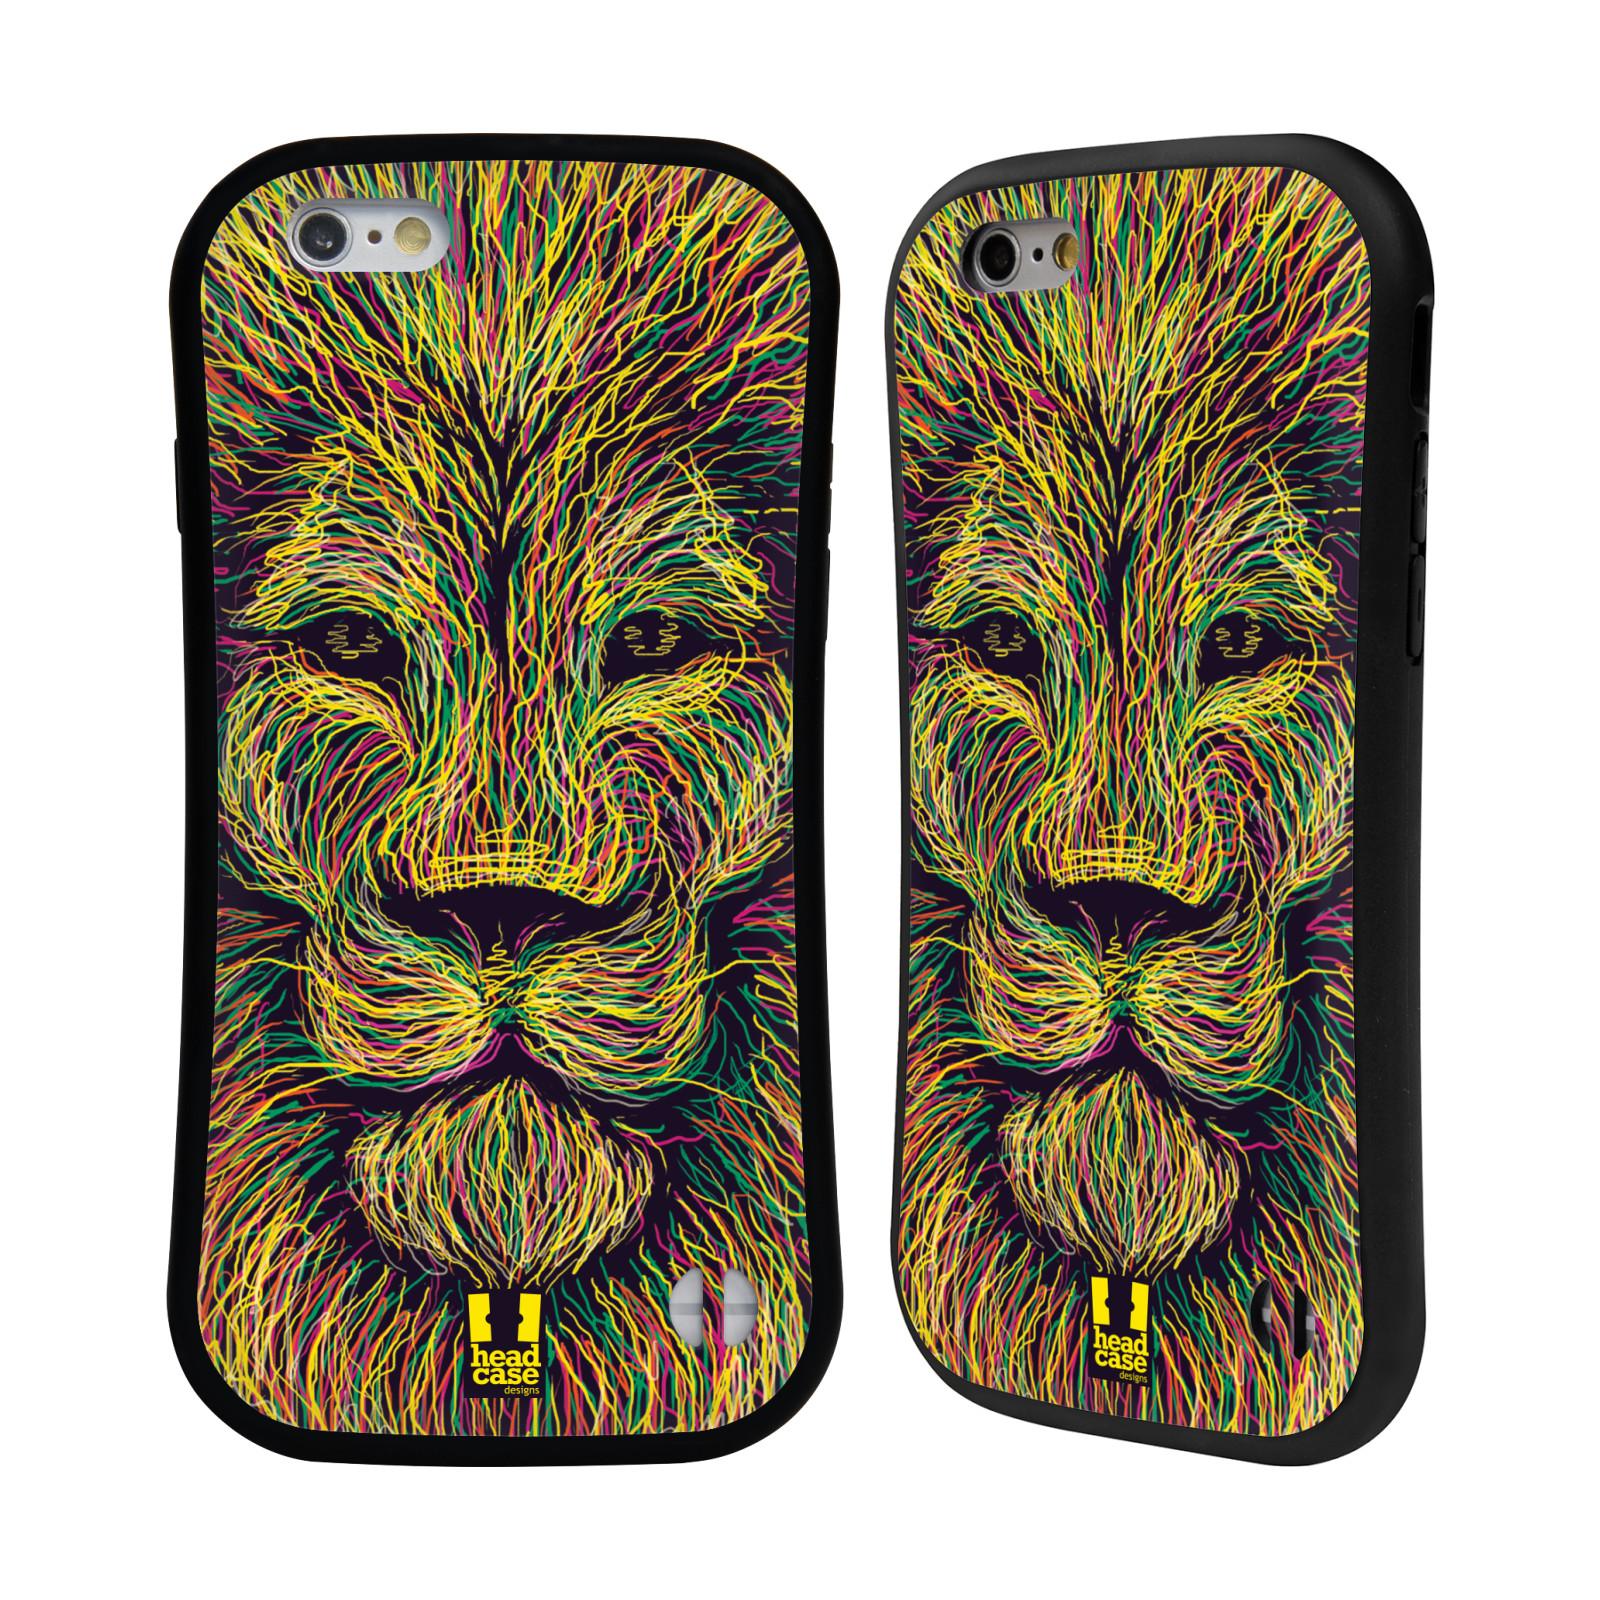 HEAD CASE silikon/plast odolný obal na mobil Apple Iphone 6/6S vzor zvíře čmáranice lev